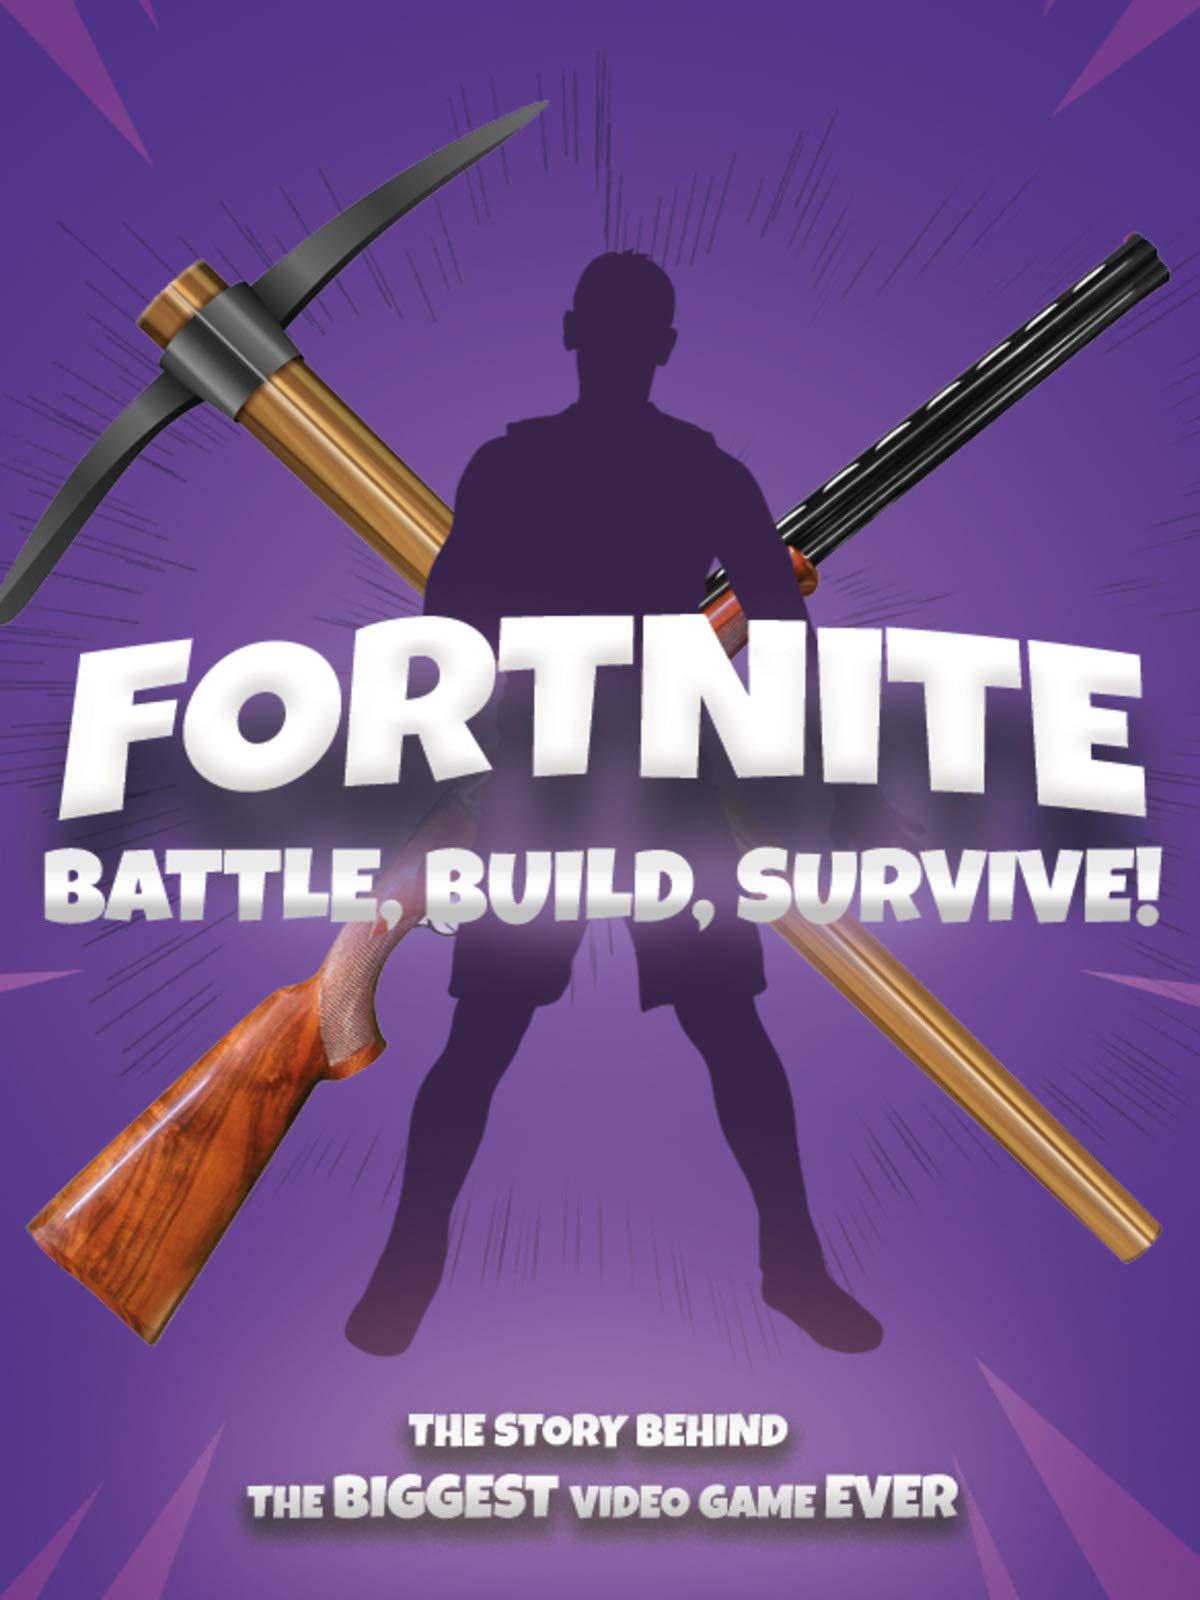 Fortnite: Battle, Build, Survive! on Amazon Prime Instant Video UK